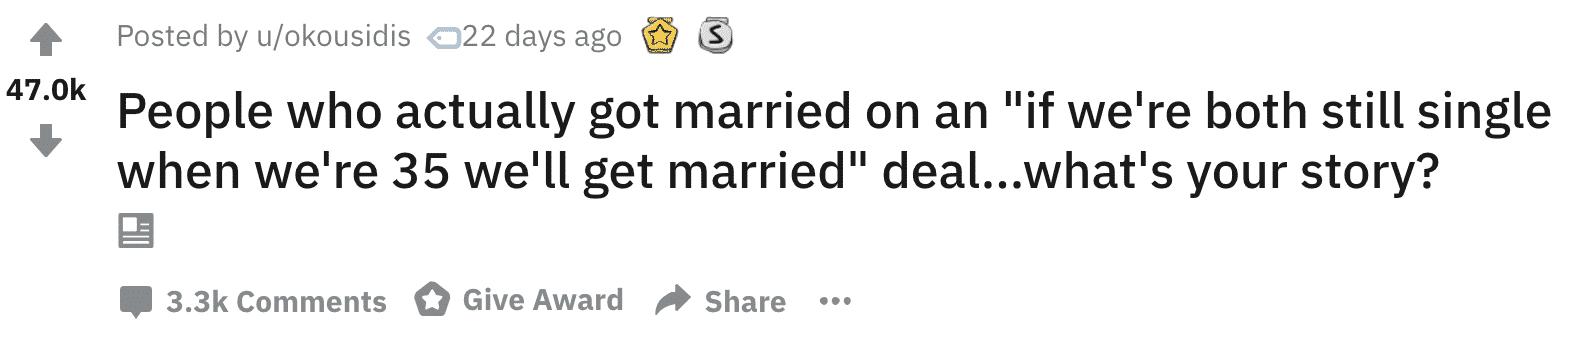 marriage pact, marriage pact stories, marriage pact askreddit